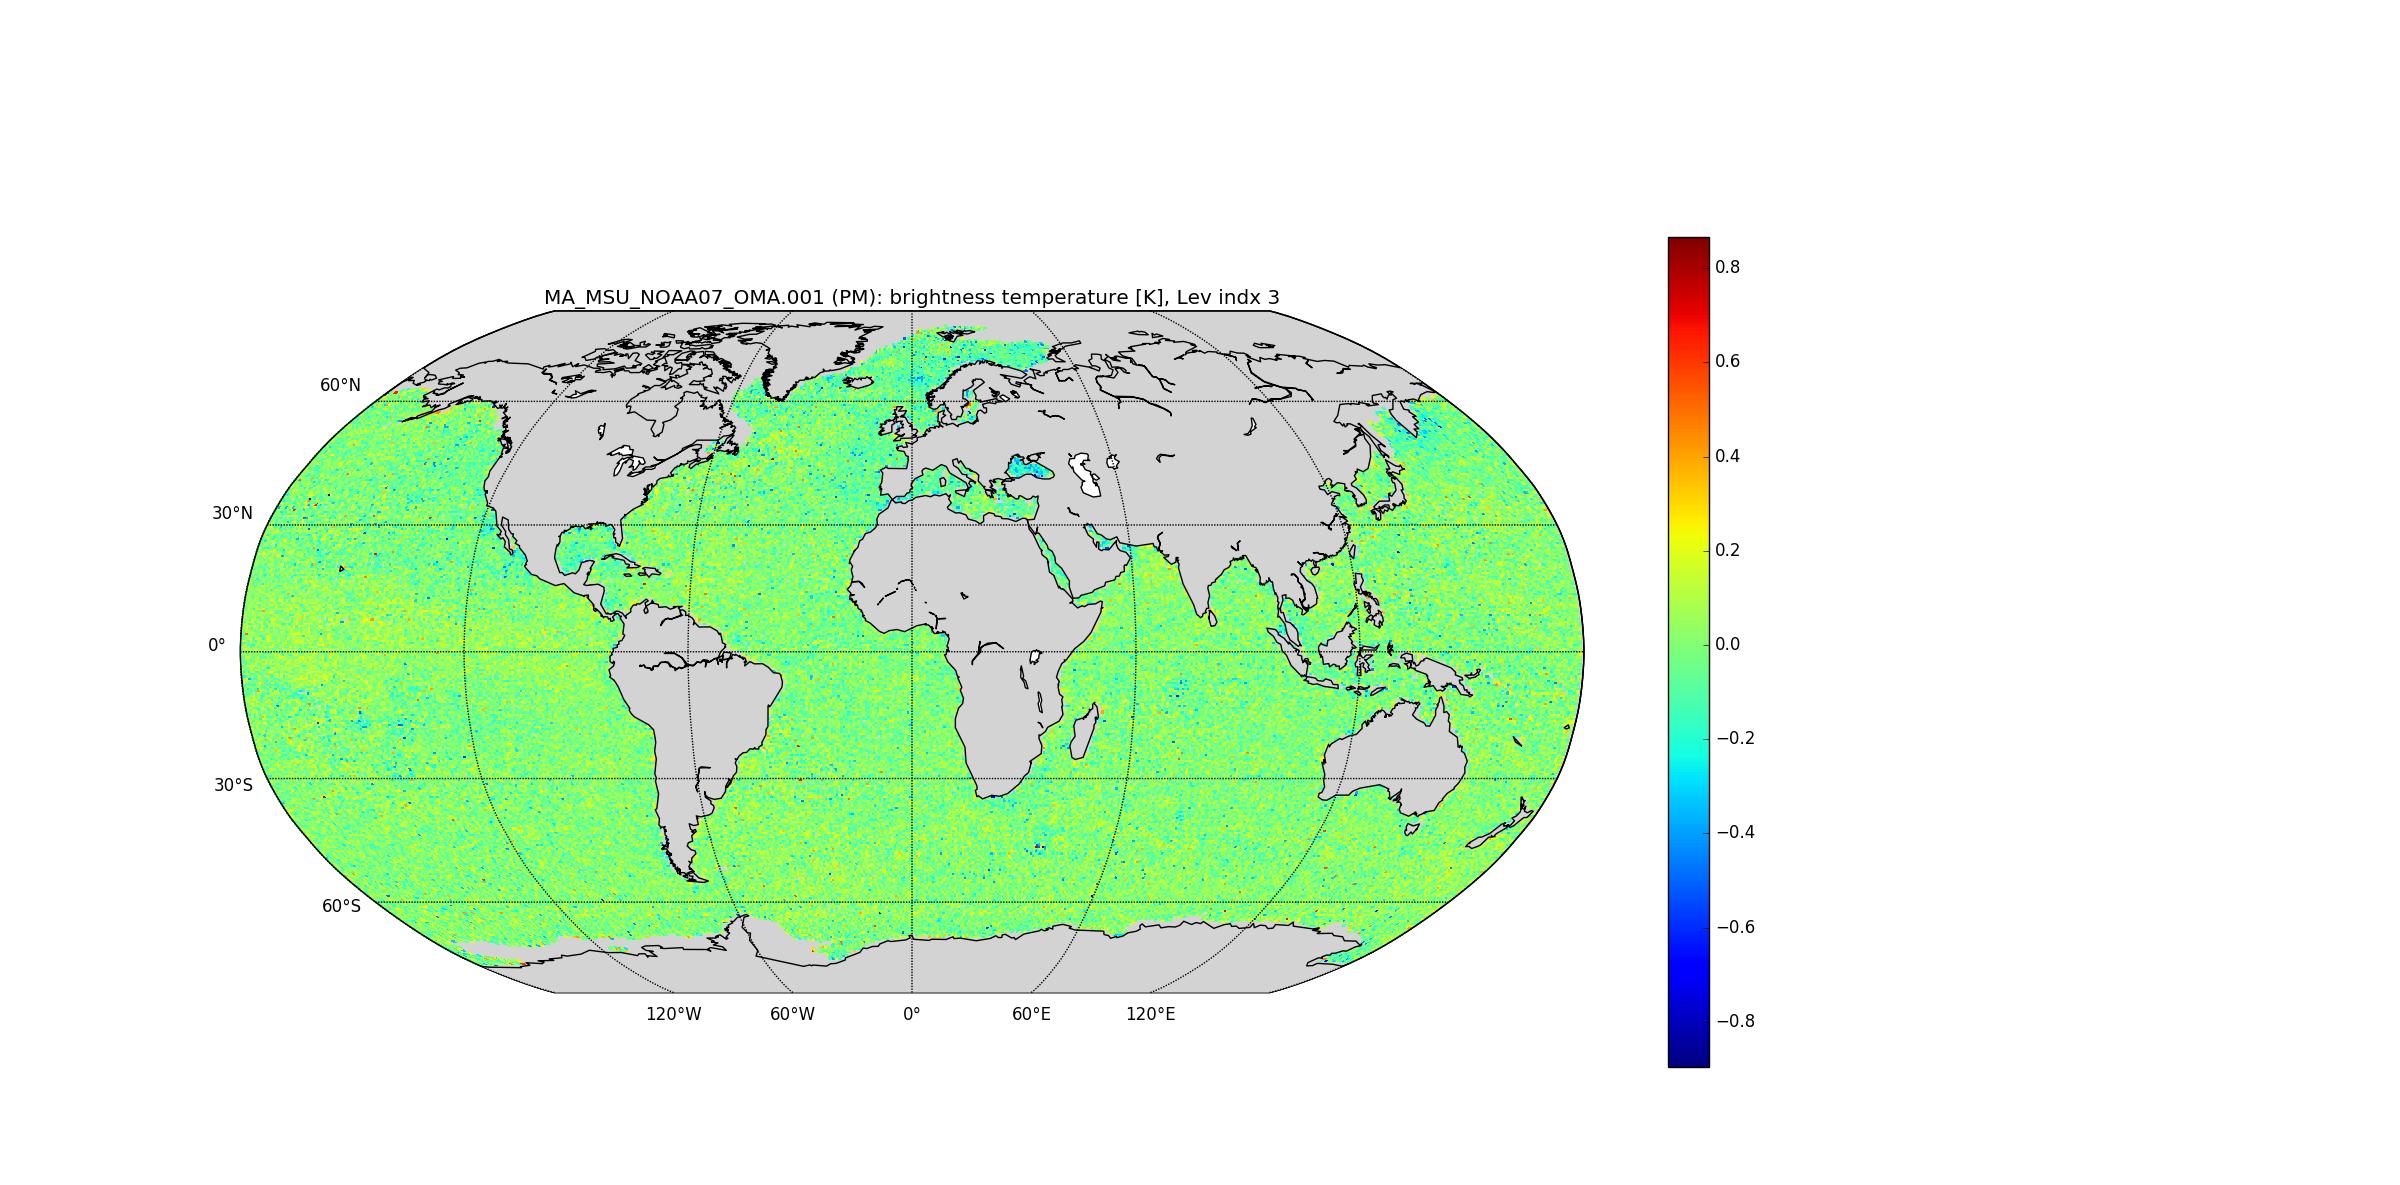 MA_MSU_NOAA07_OMA variable